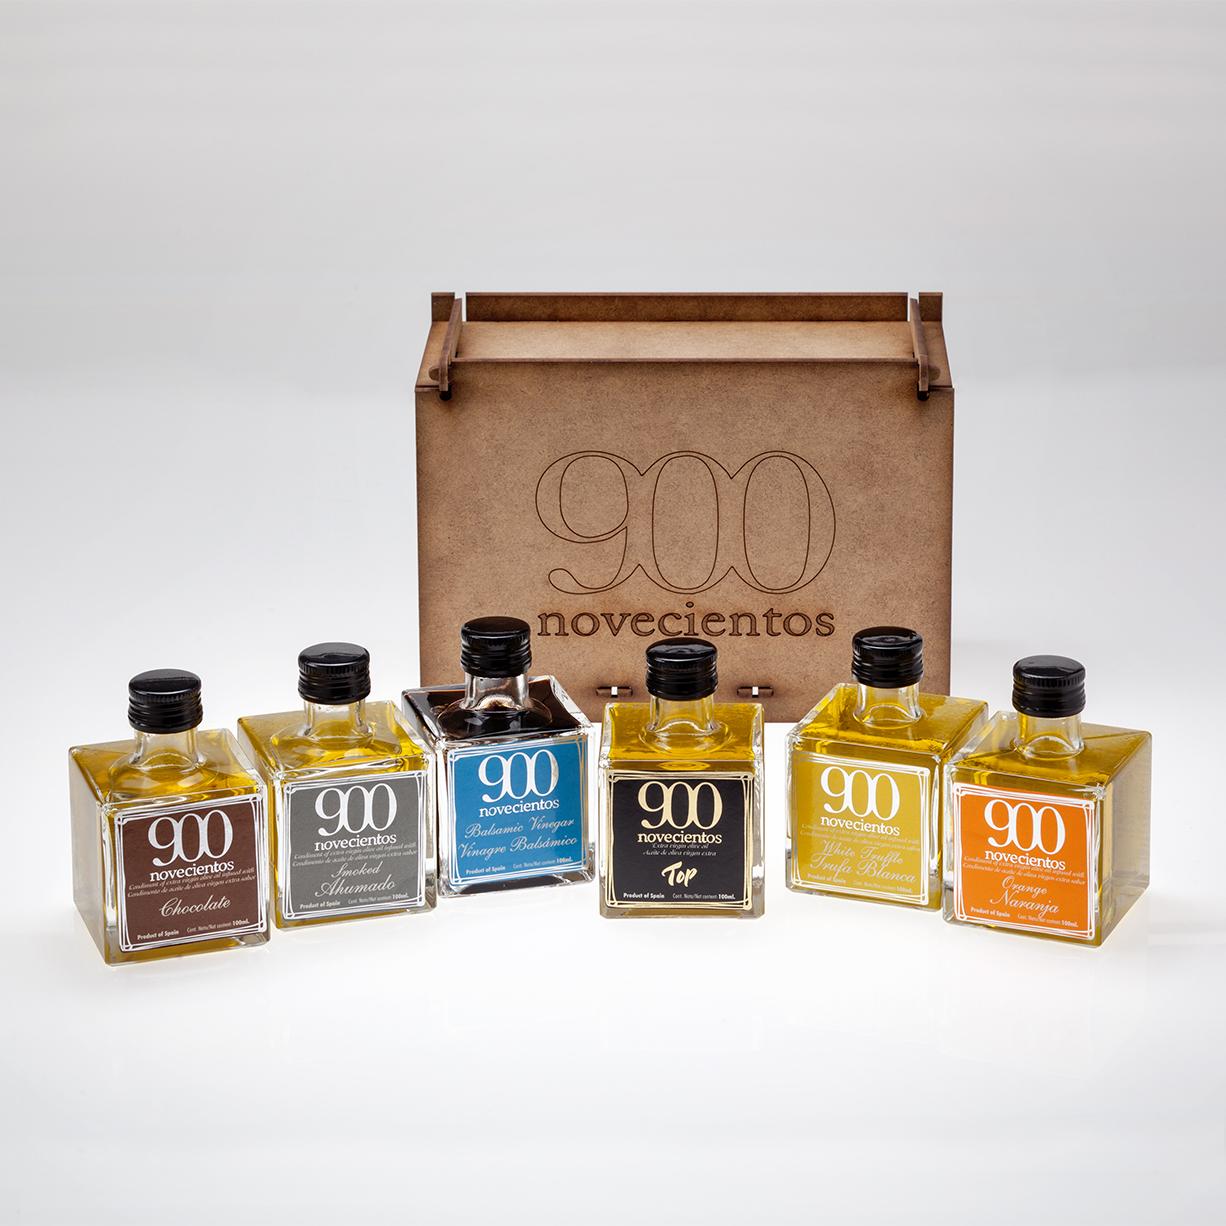 Lote EVOO 900 de aromas y vinagre, Naranja